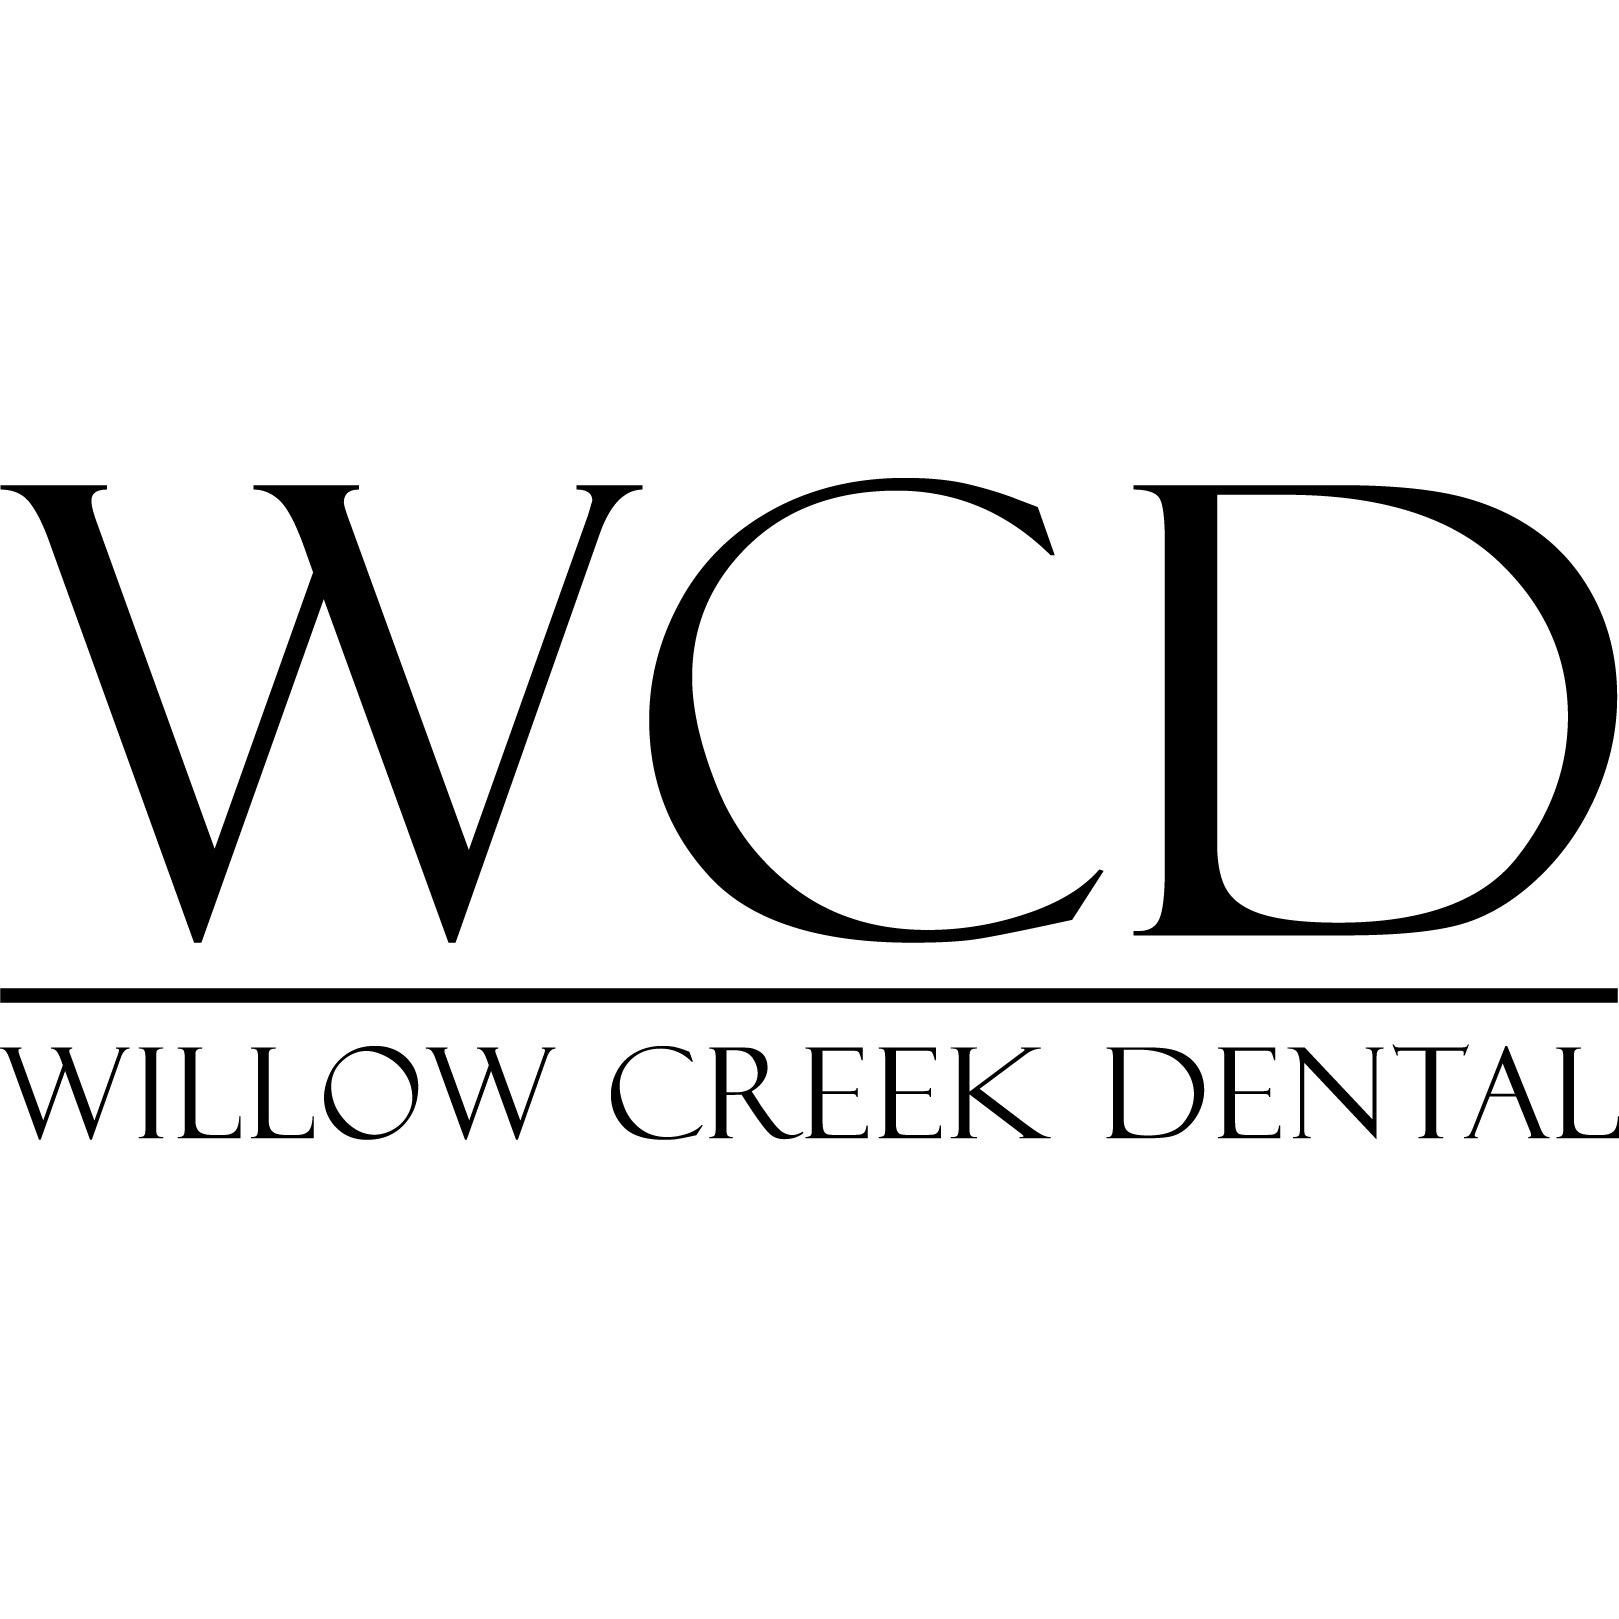 Willow Creek Dental